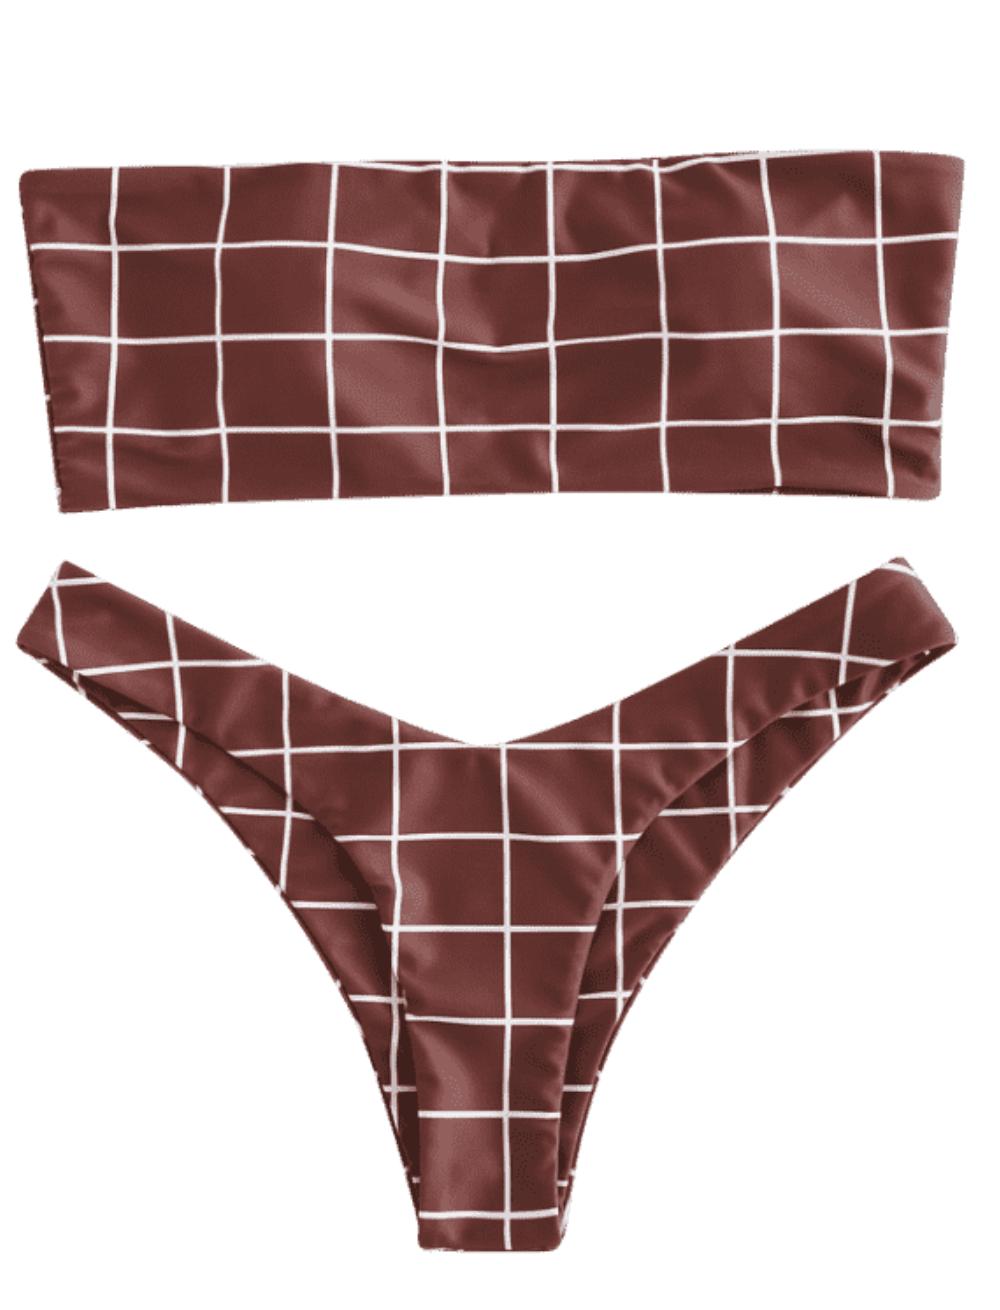 Plaid Bandeau High Leg Bikini Set - Red Wine | Cute, Sexy Honeymoon, Vacation, Summer Bikinis, Swim Suits | Miranda Schroeder Blog